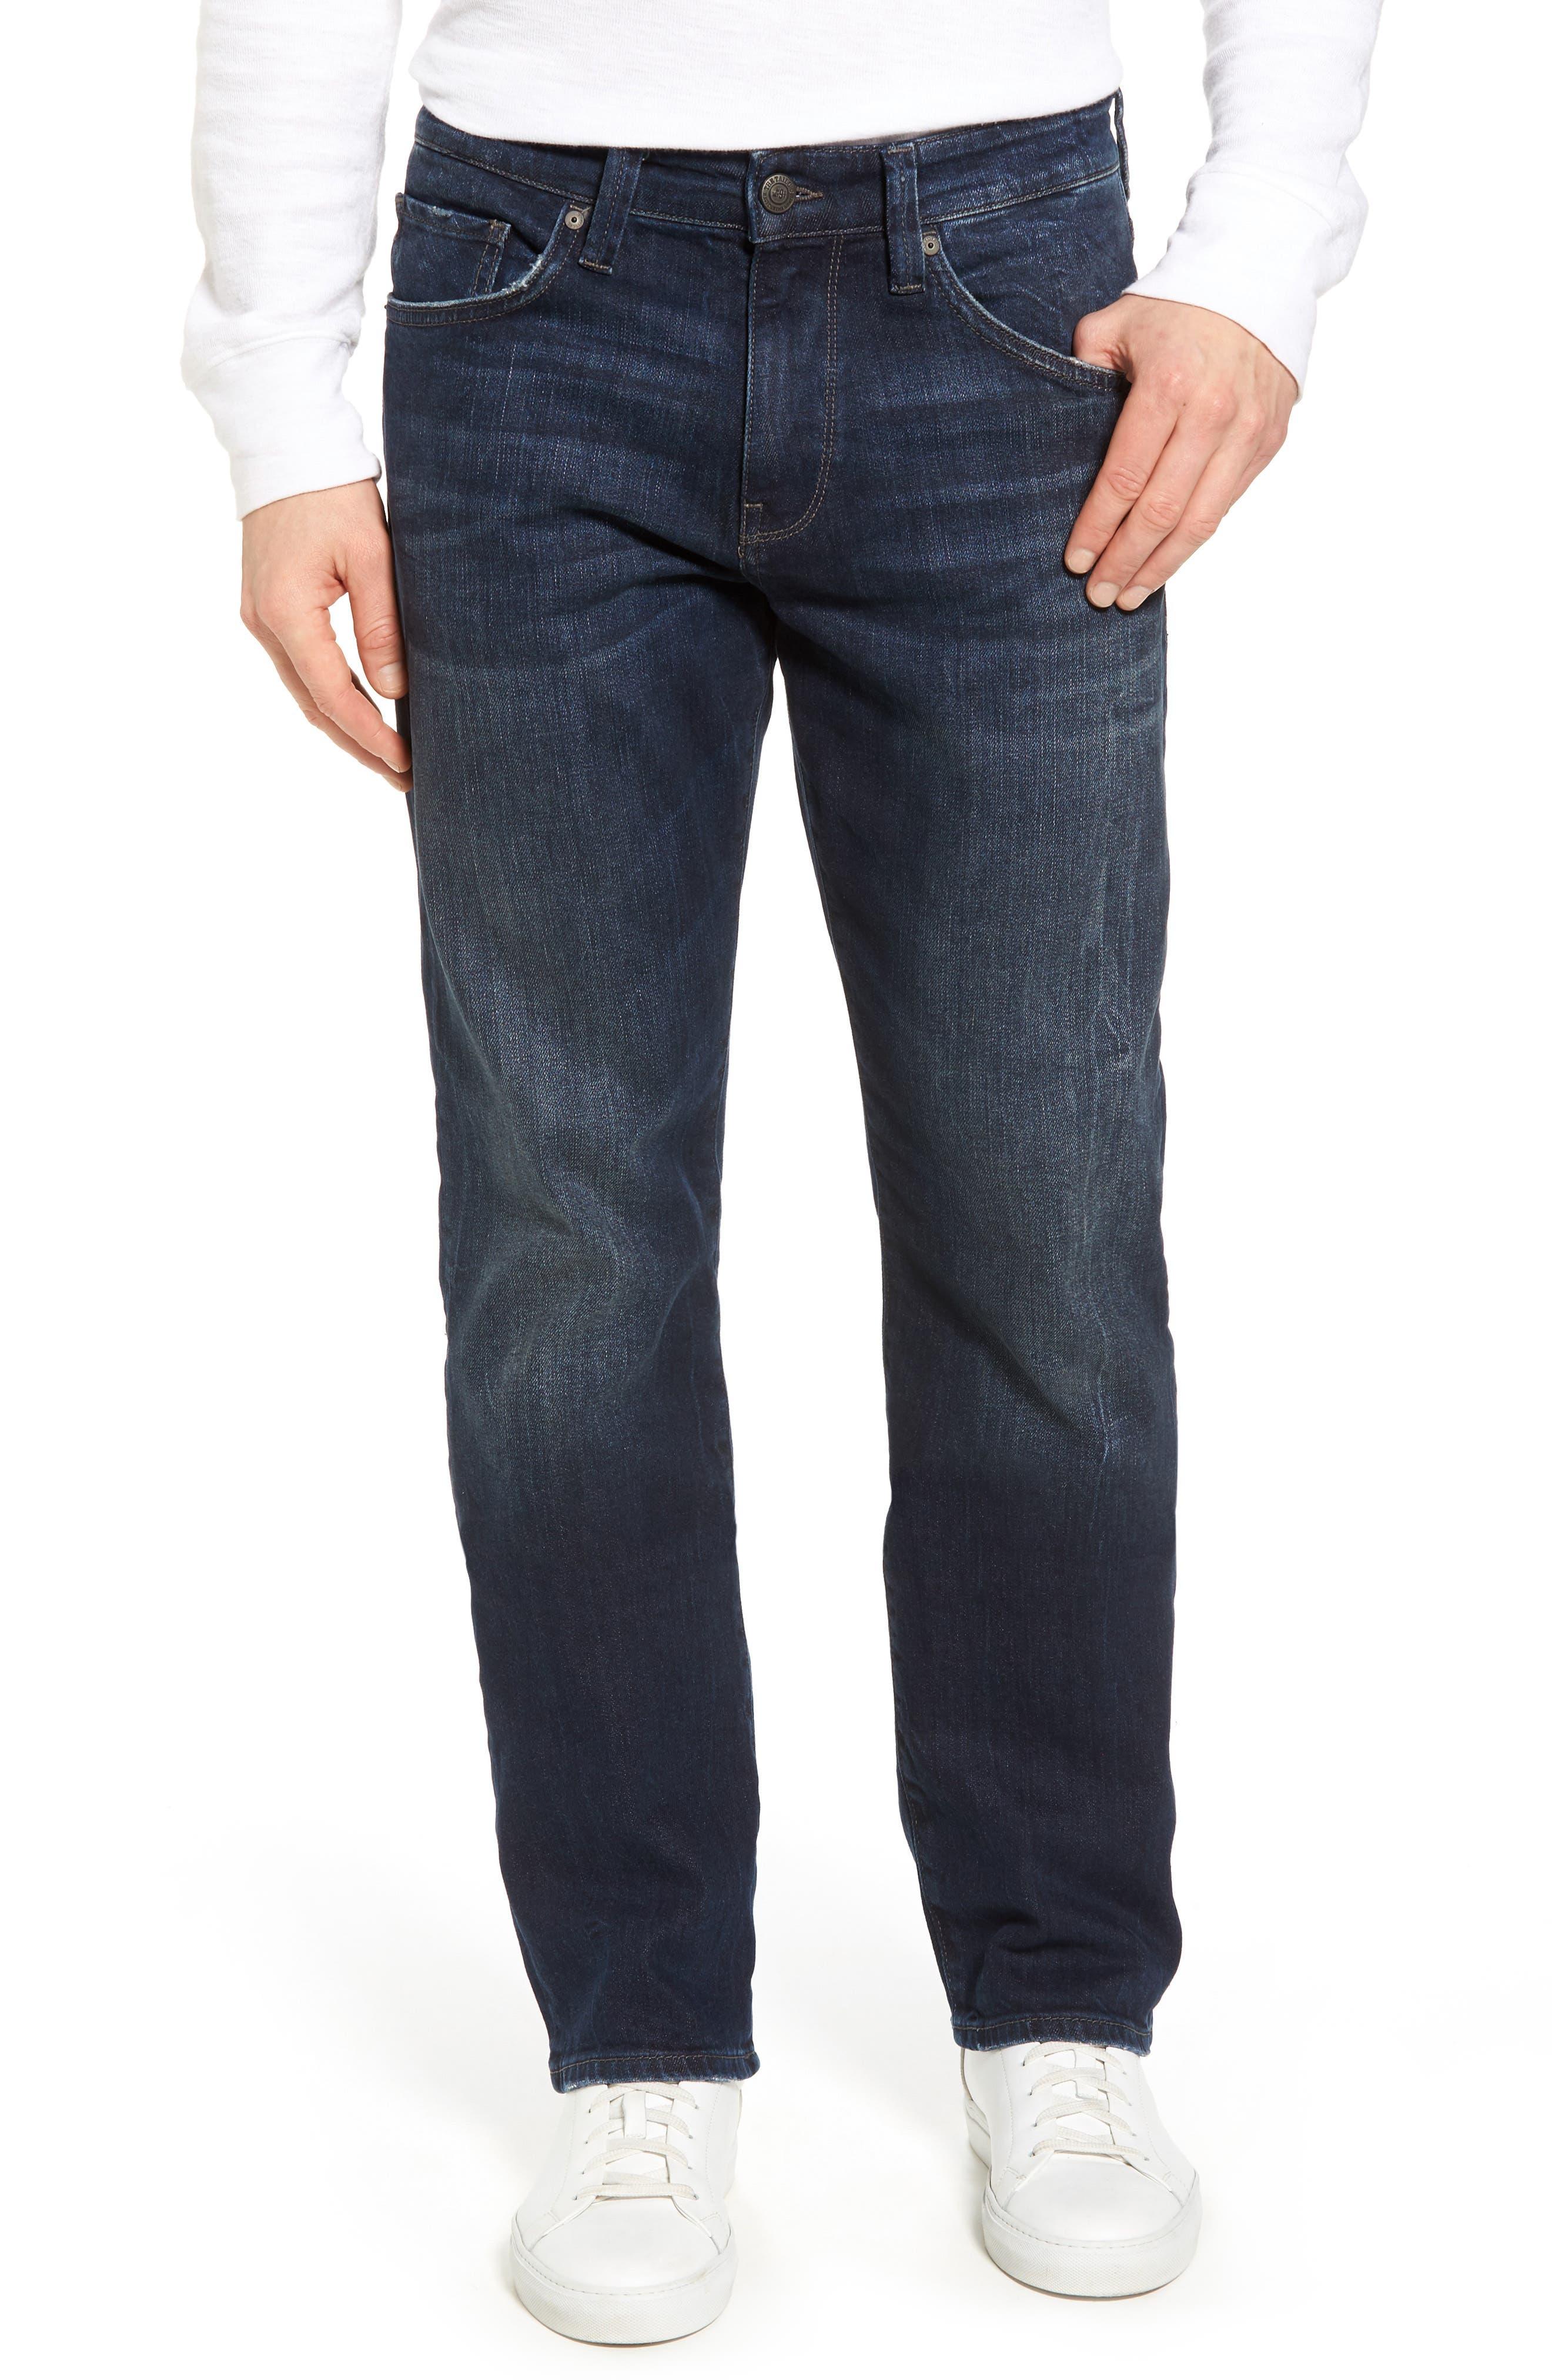 Myles Straight Leg Jeans,                             Main thumbnail 1, color,                             Deep Brooklyn